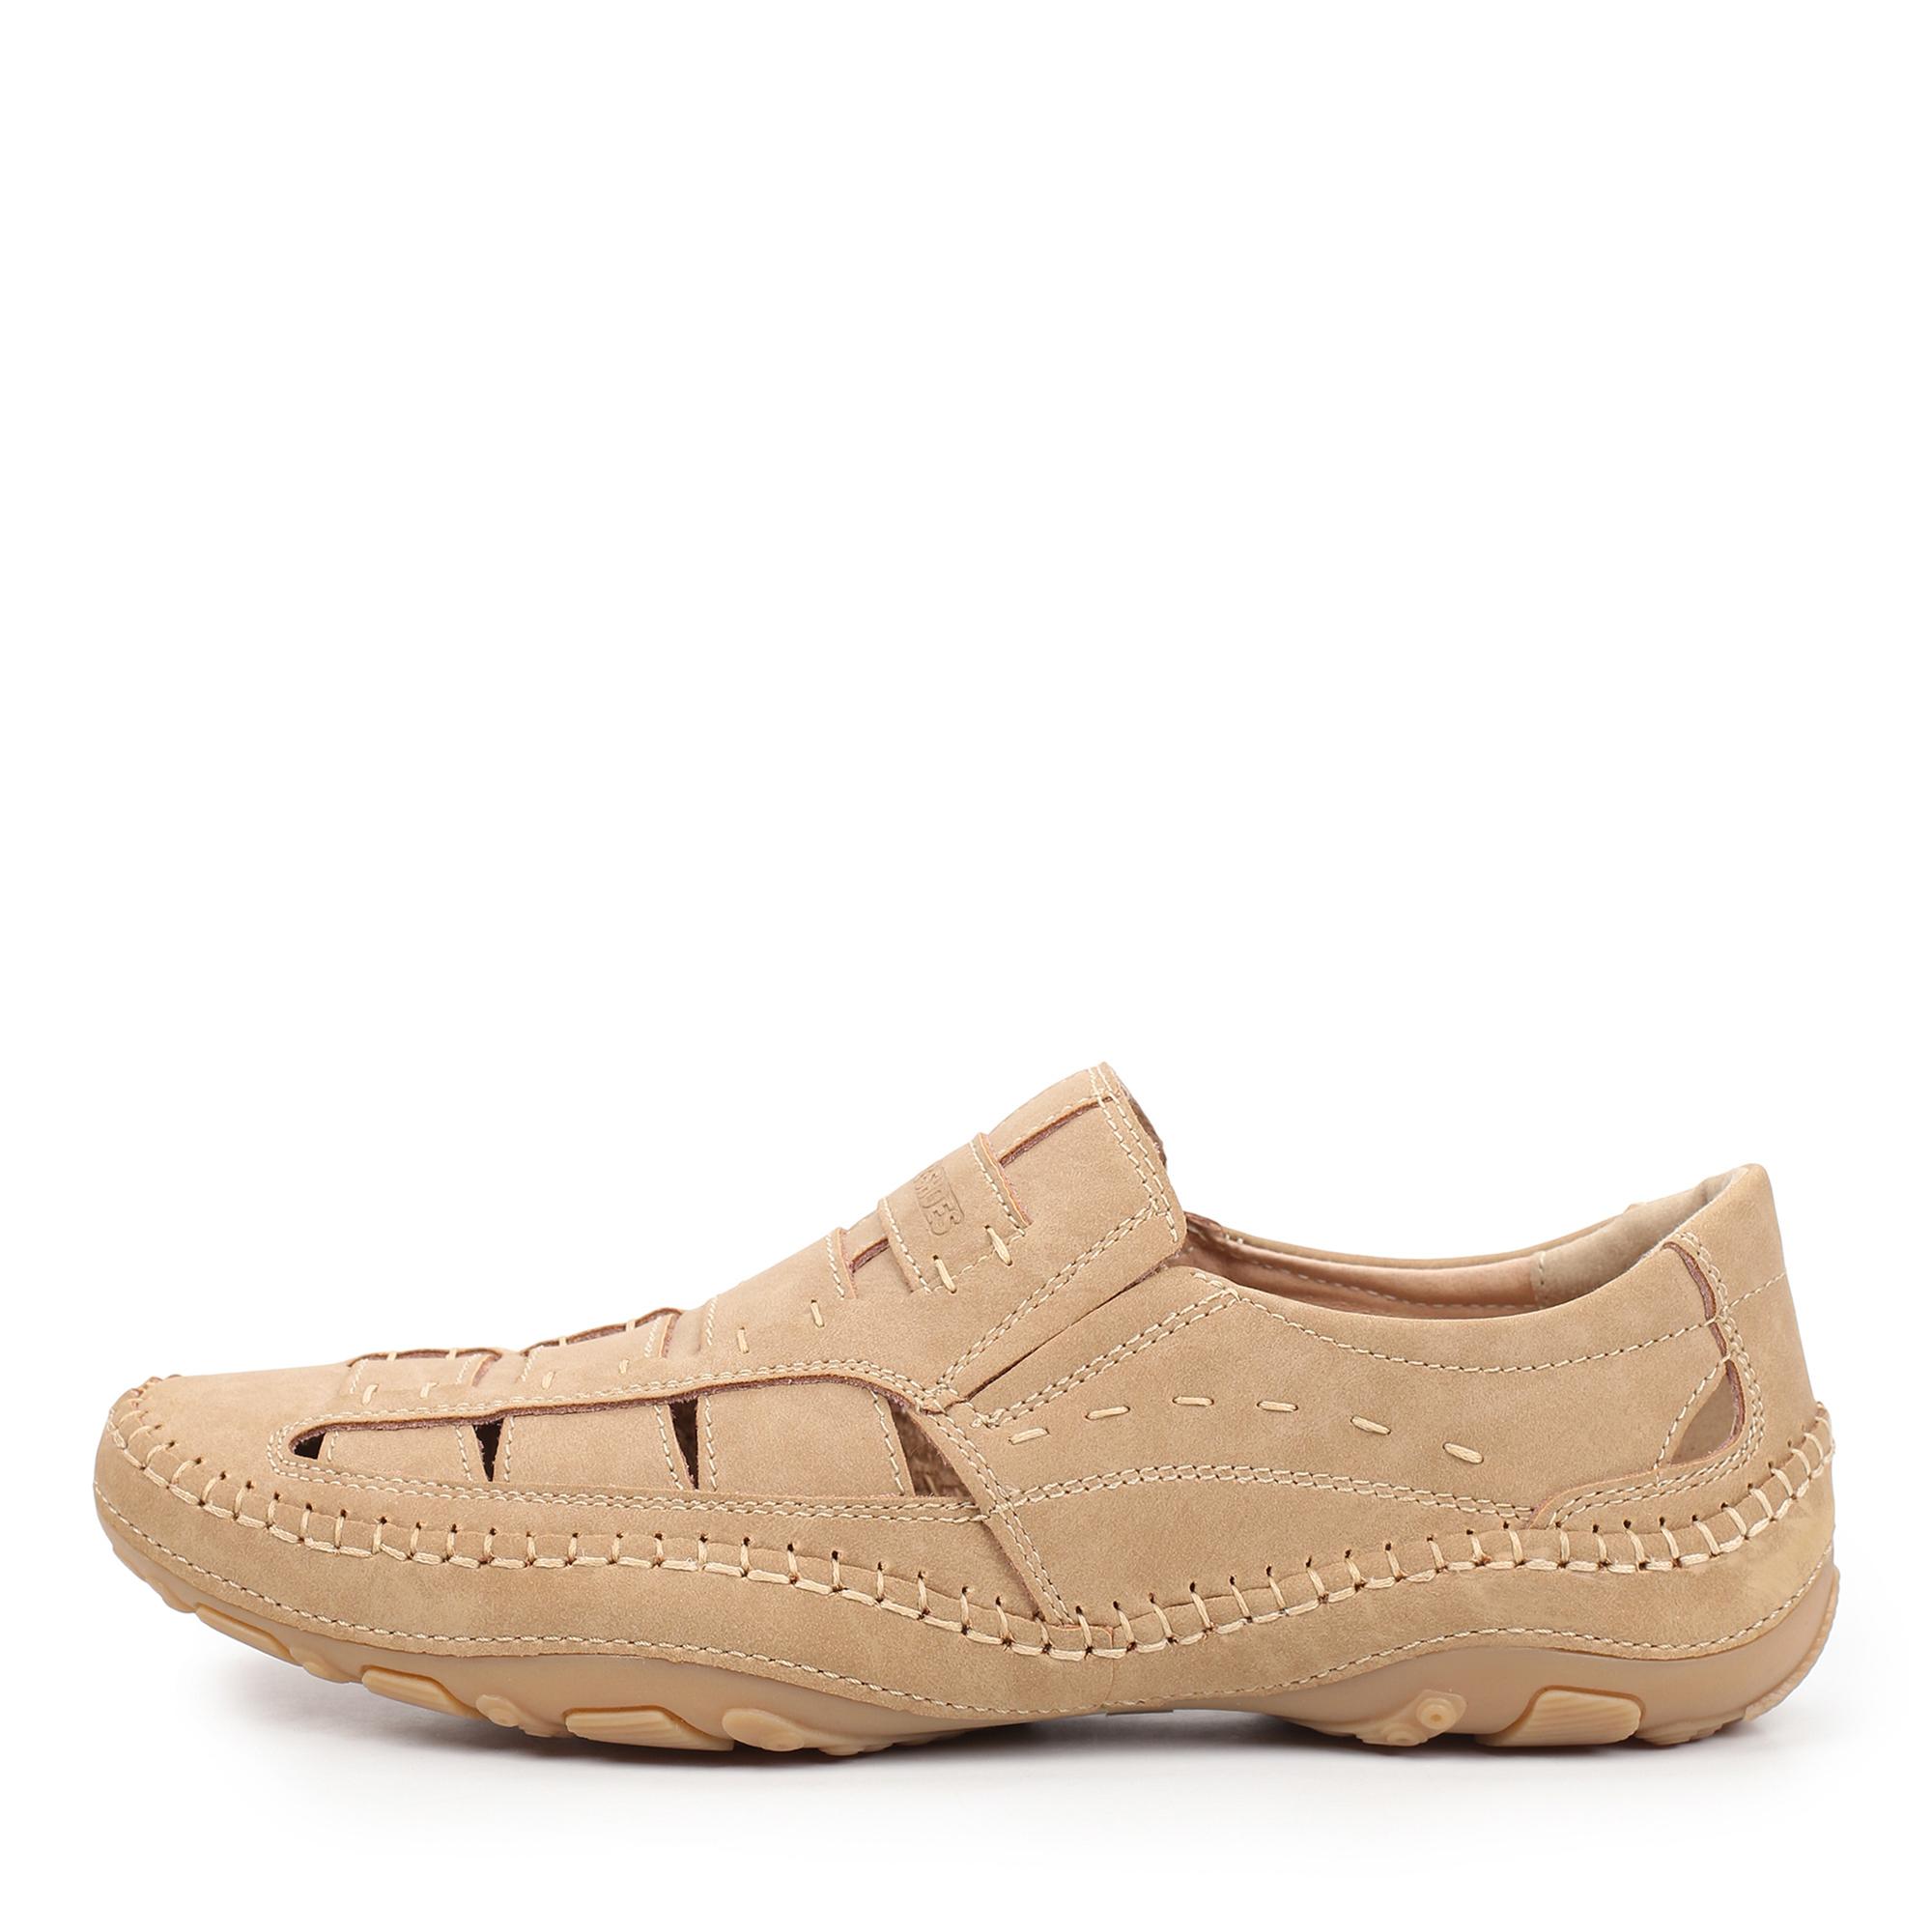 Туфли/полуботинки MUNZ Shoes 187-189A-1608